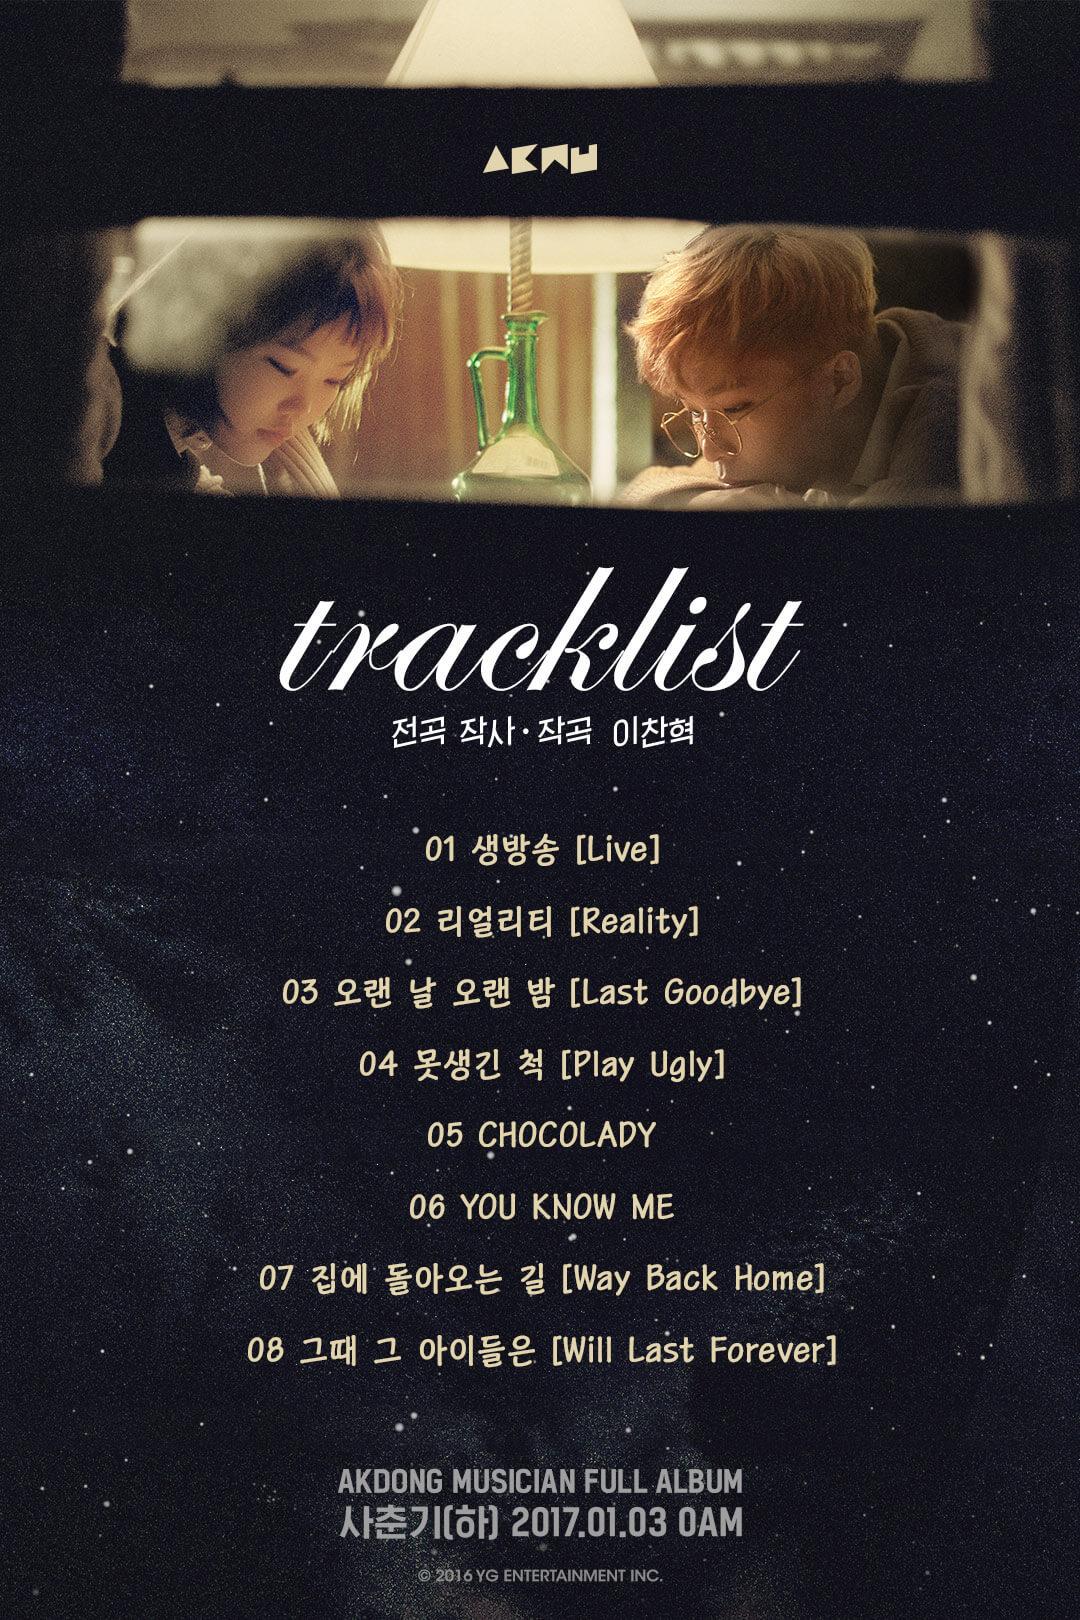 Akdong Musician Reveals Their Impressive Tracklist For Comeback